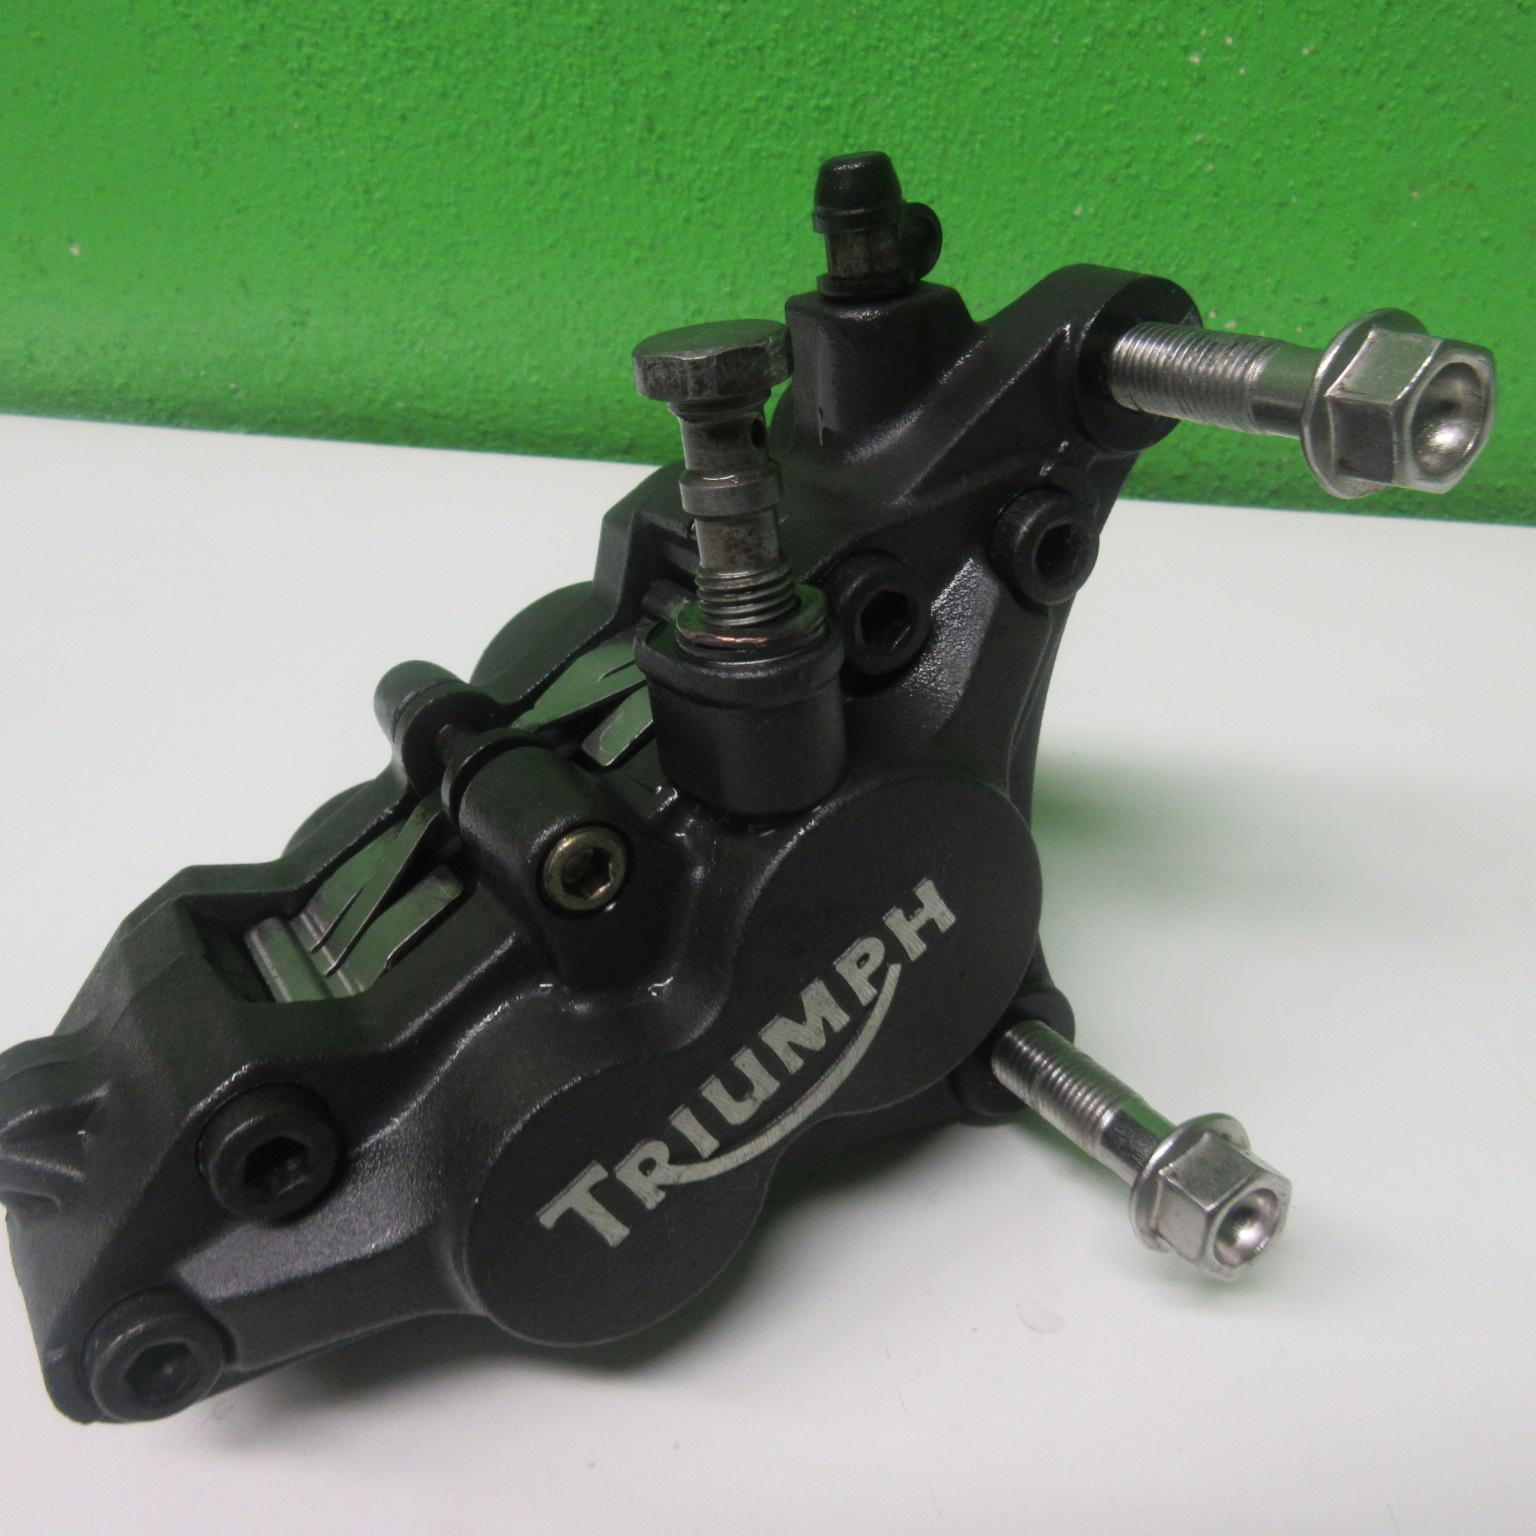 Bremssattel vorne rechts Triumph Sprint RS 955 695 AC